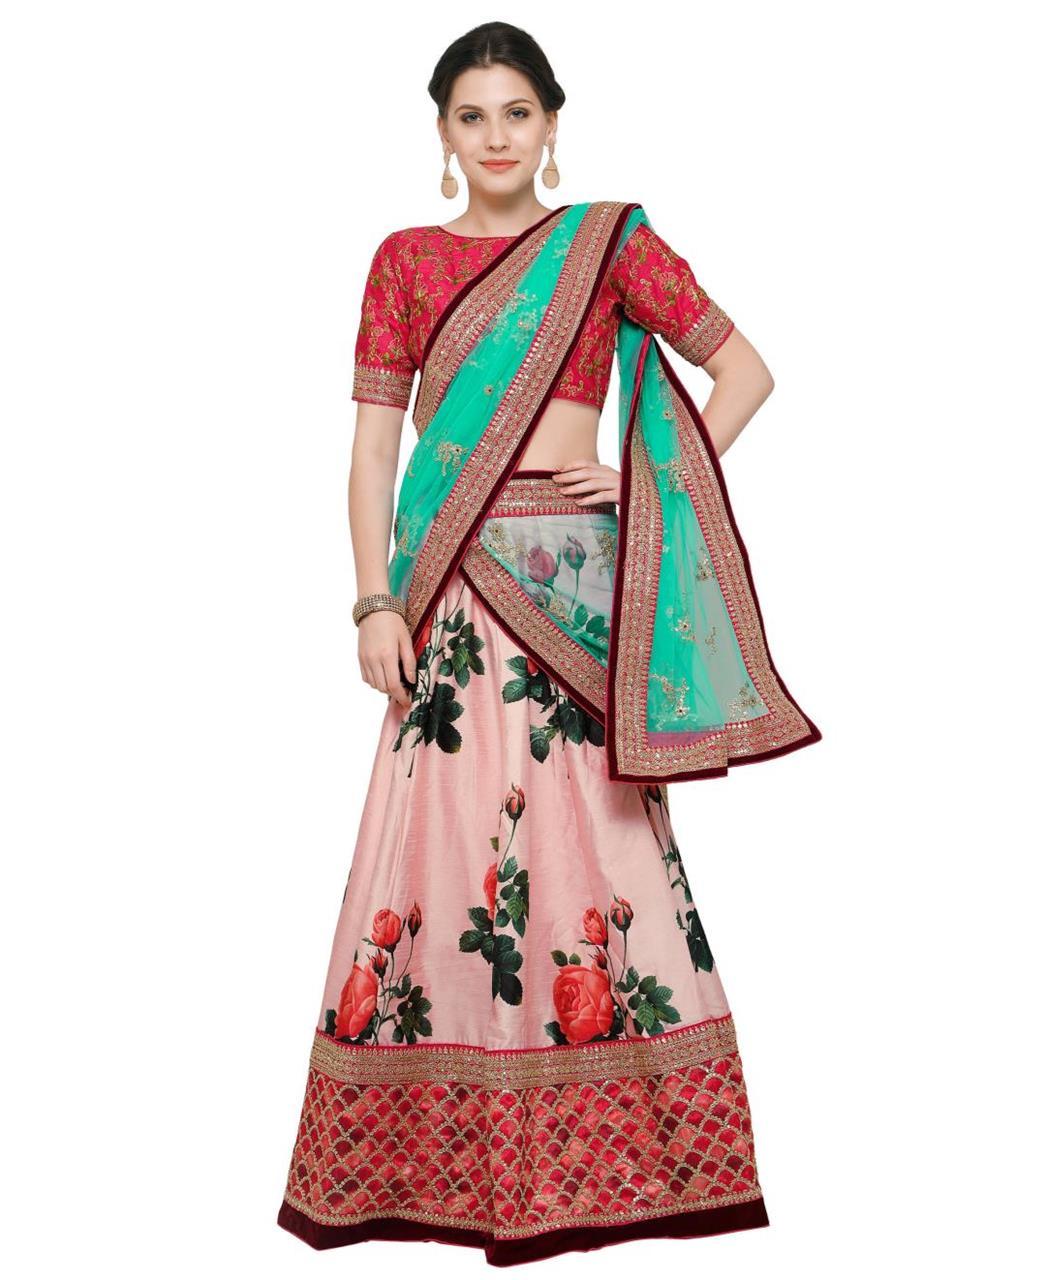 Embroidered Bangalore Silk Pink Long choli Lehenga Choli Ghagra